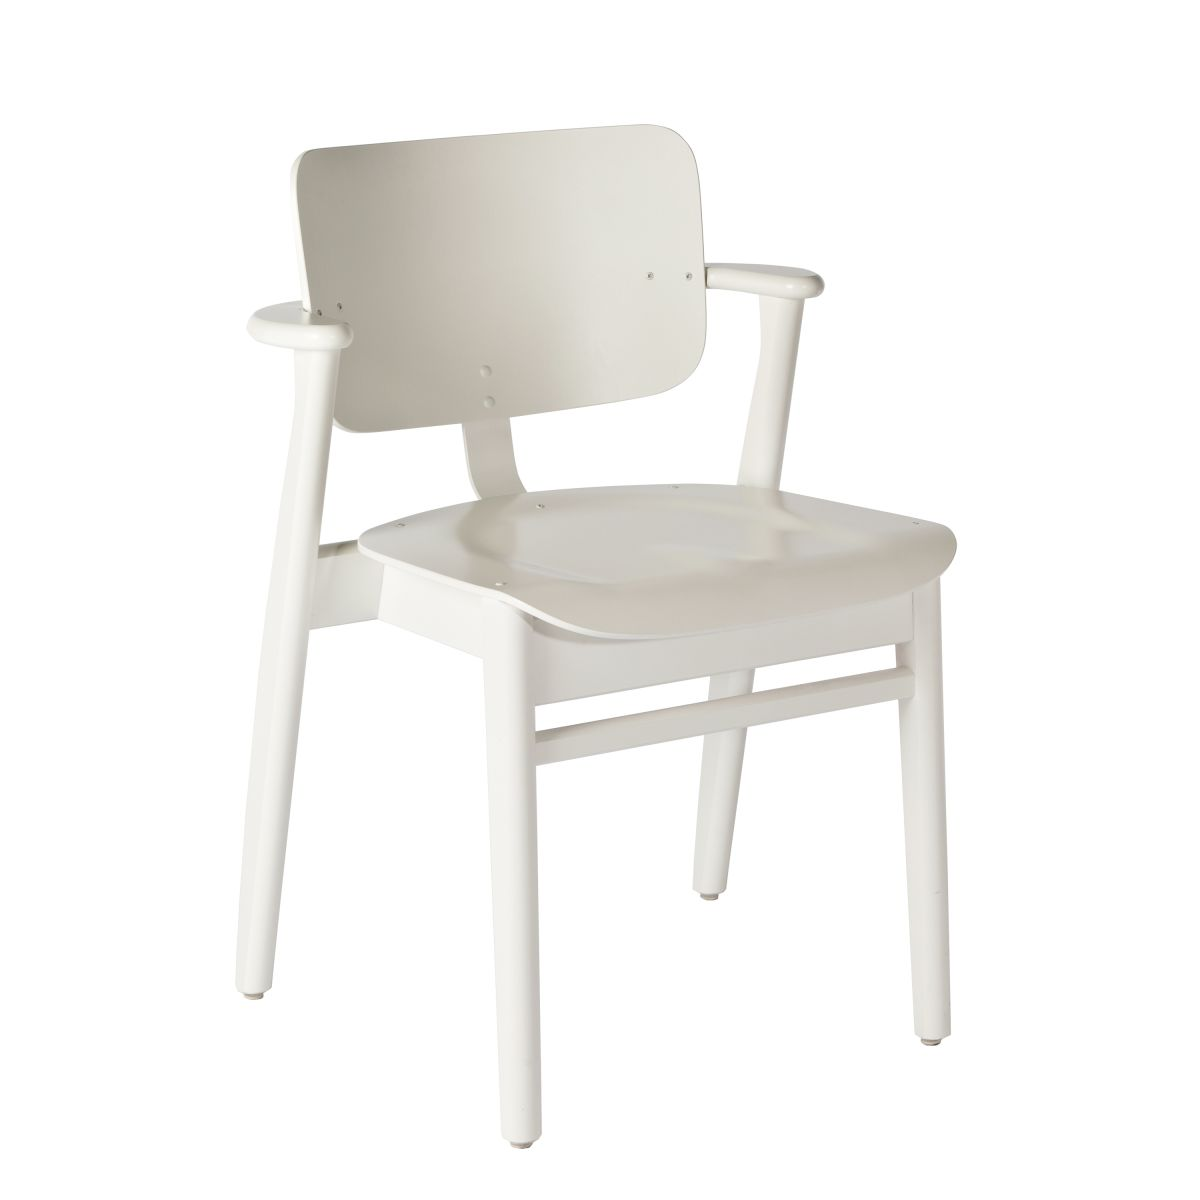 Domus Chair white lacquer